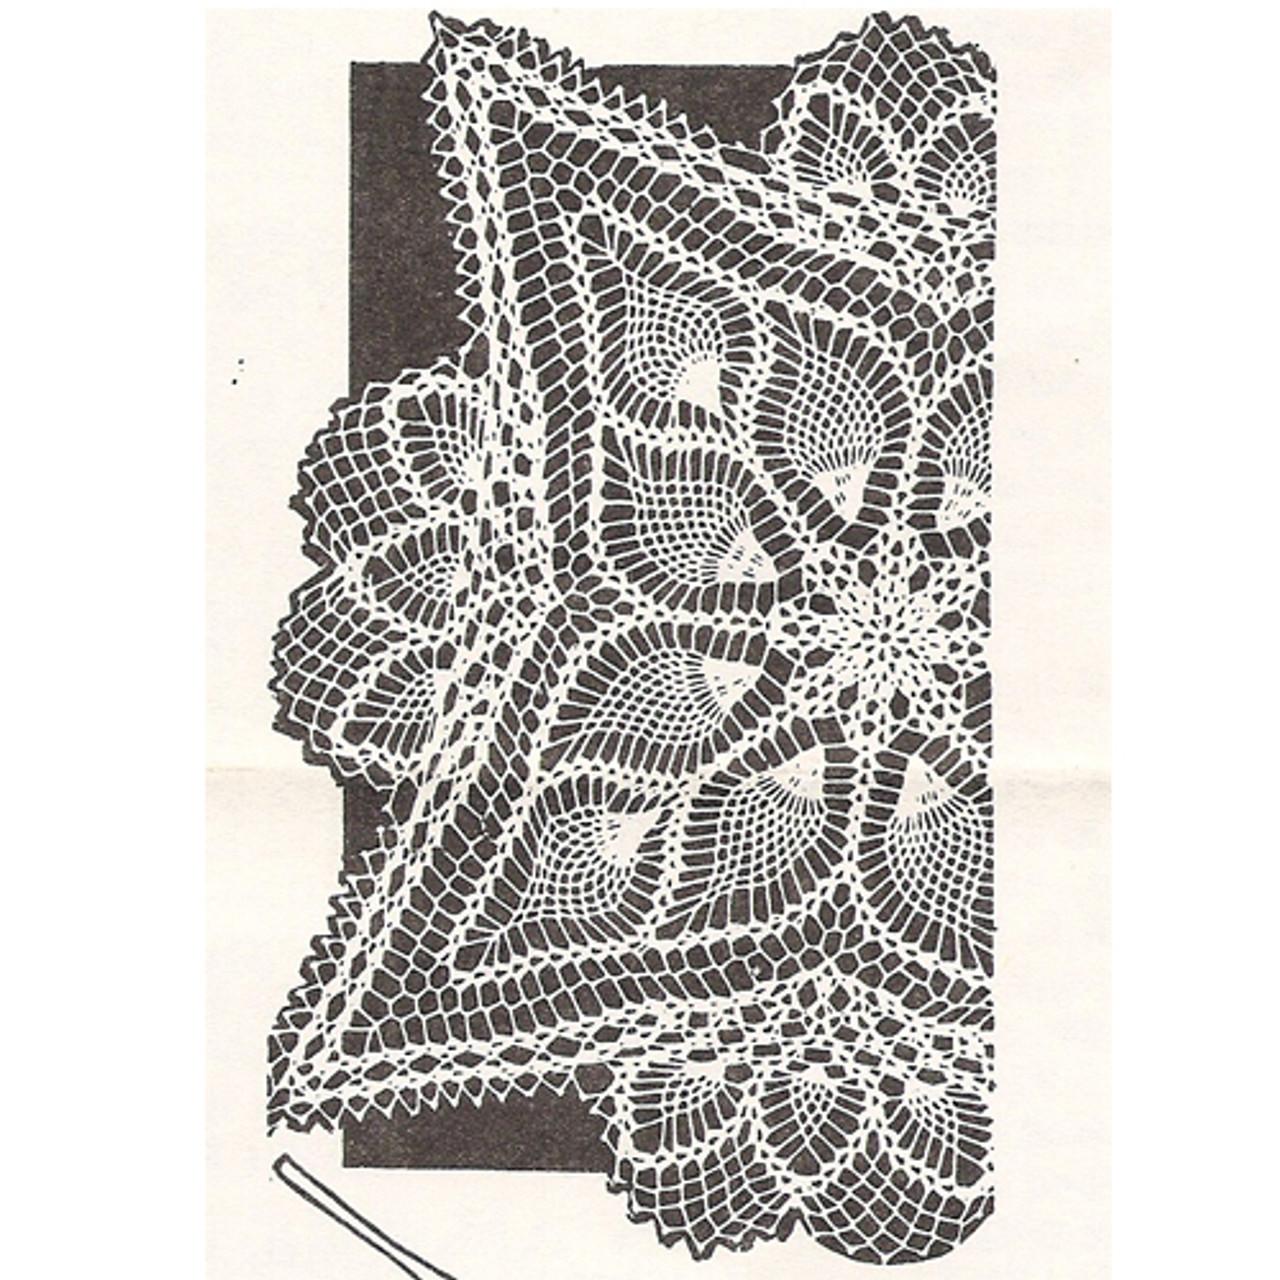 Square Crocheted Pineapple Doily Pattern Design 7209